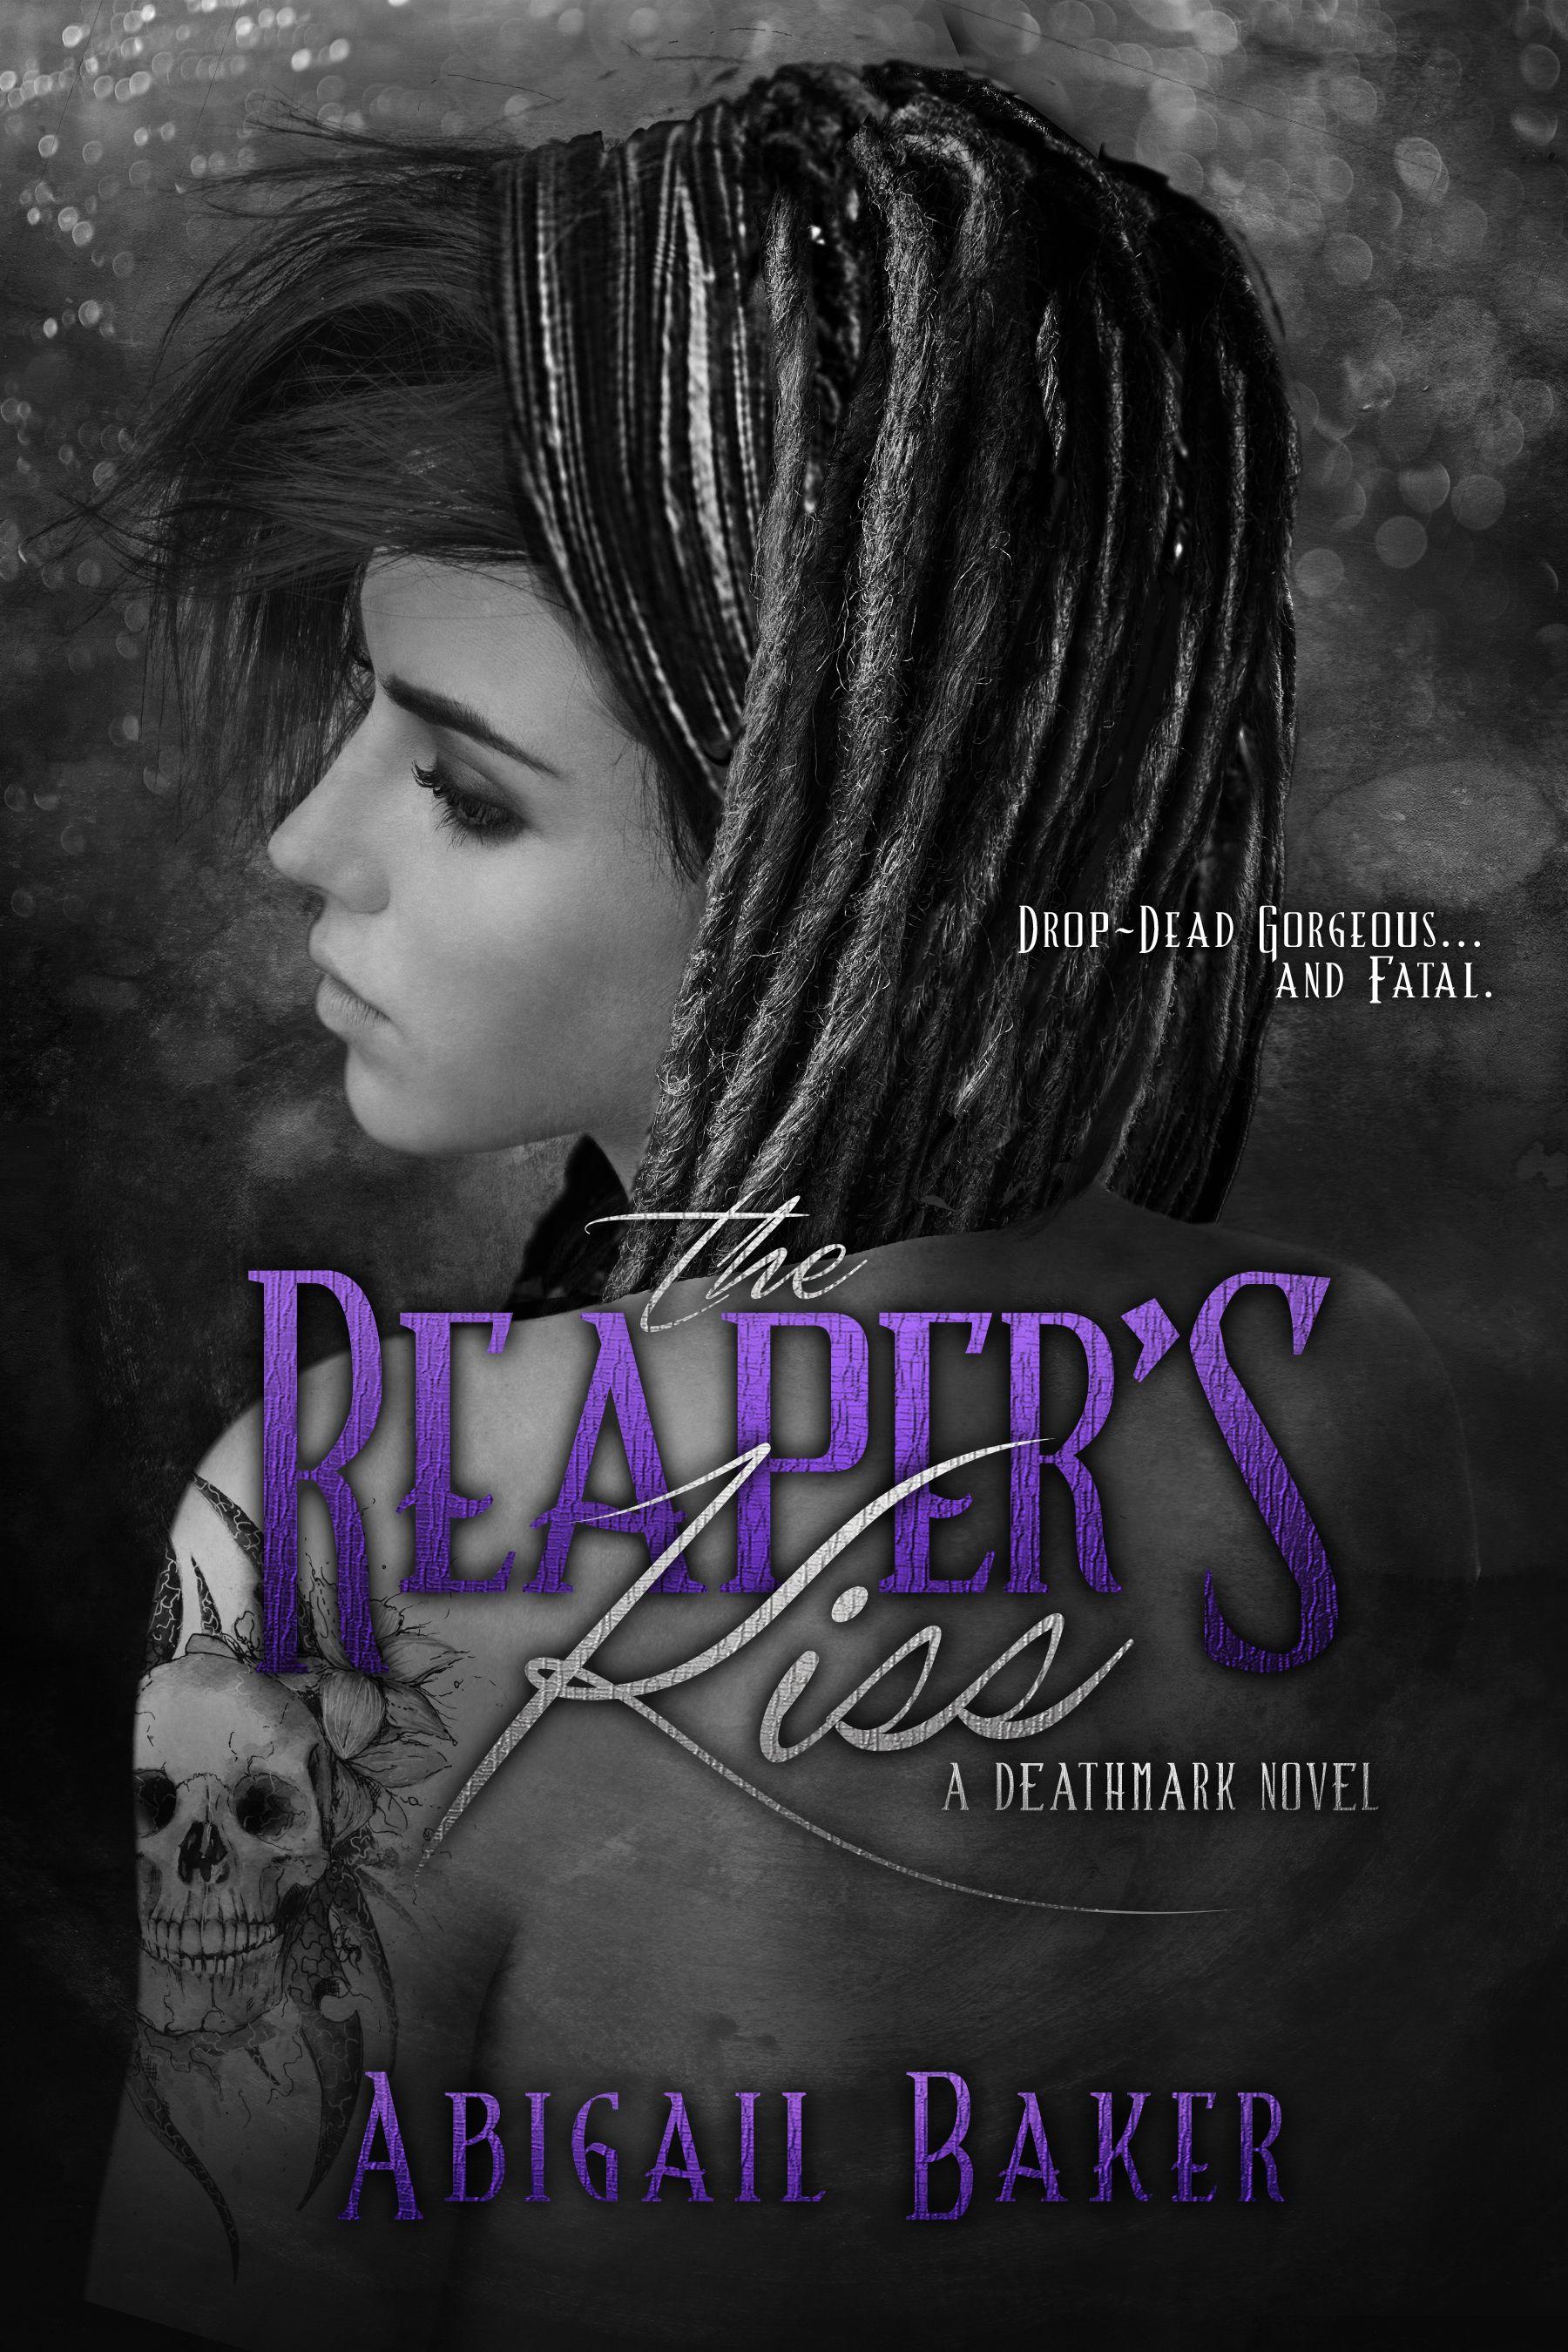 Title: The Reaper's Kiss Author: Abigail Baker Release date: August 25th 2015 Publisher: Entangled Genre: Paranormal, Romance, Fantasy Book Description: Drop-dead gorgeous…and fatal. Ollie Dormier'...